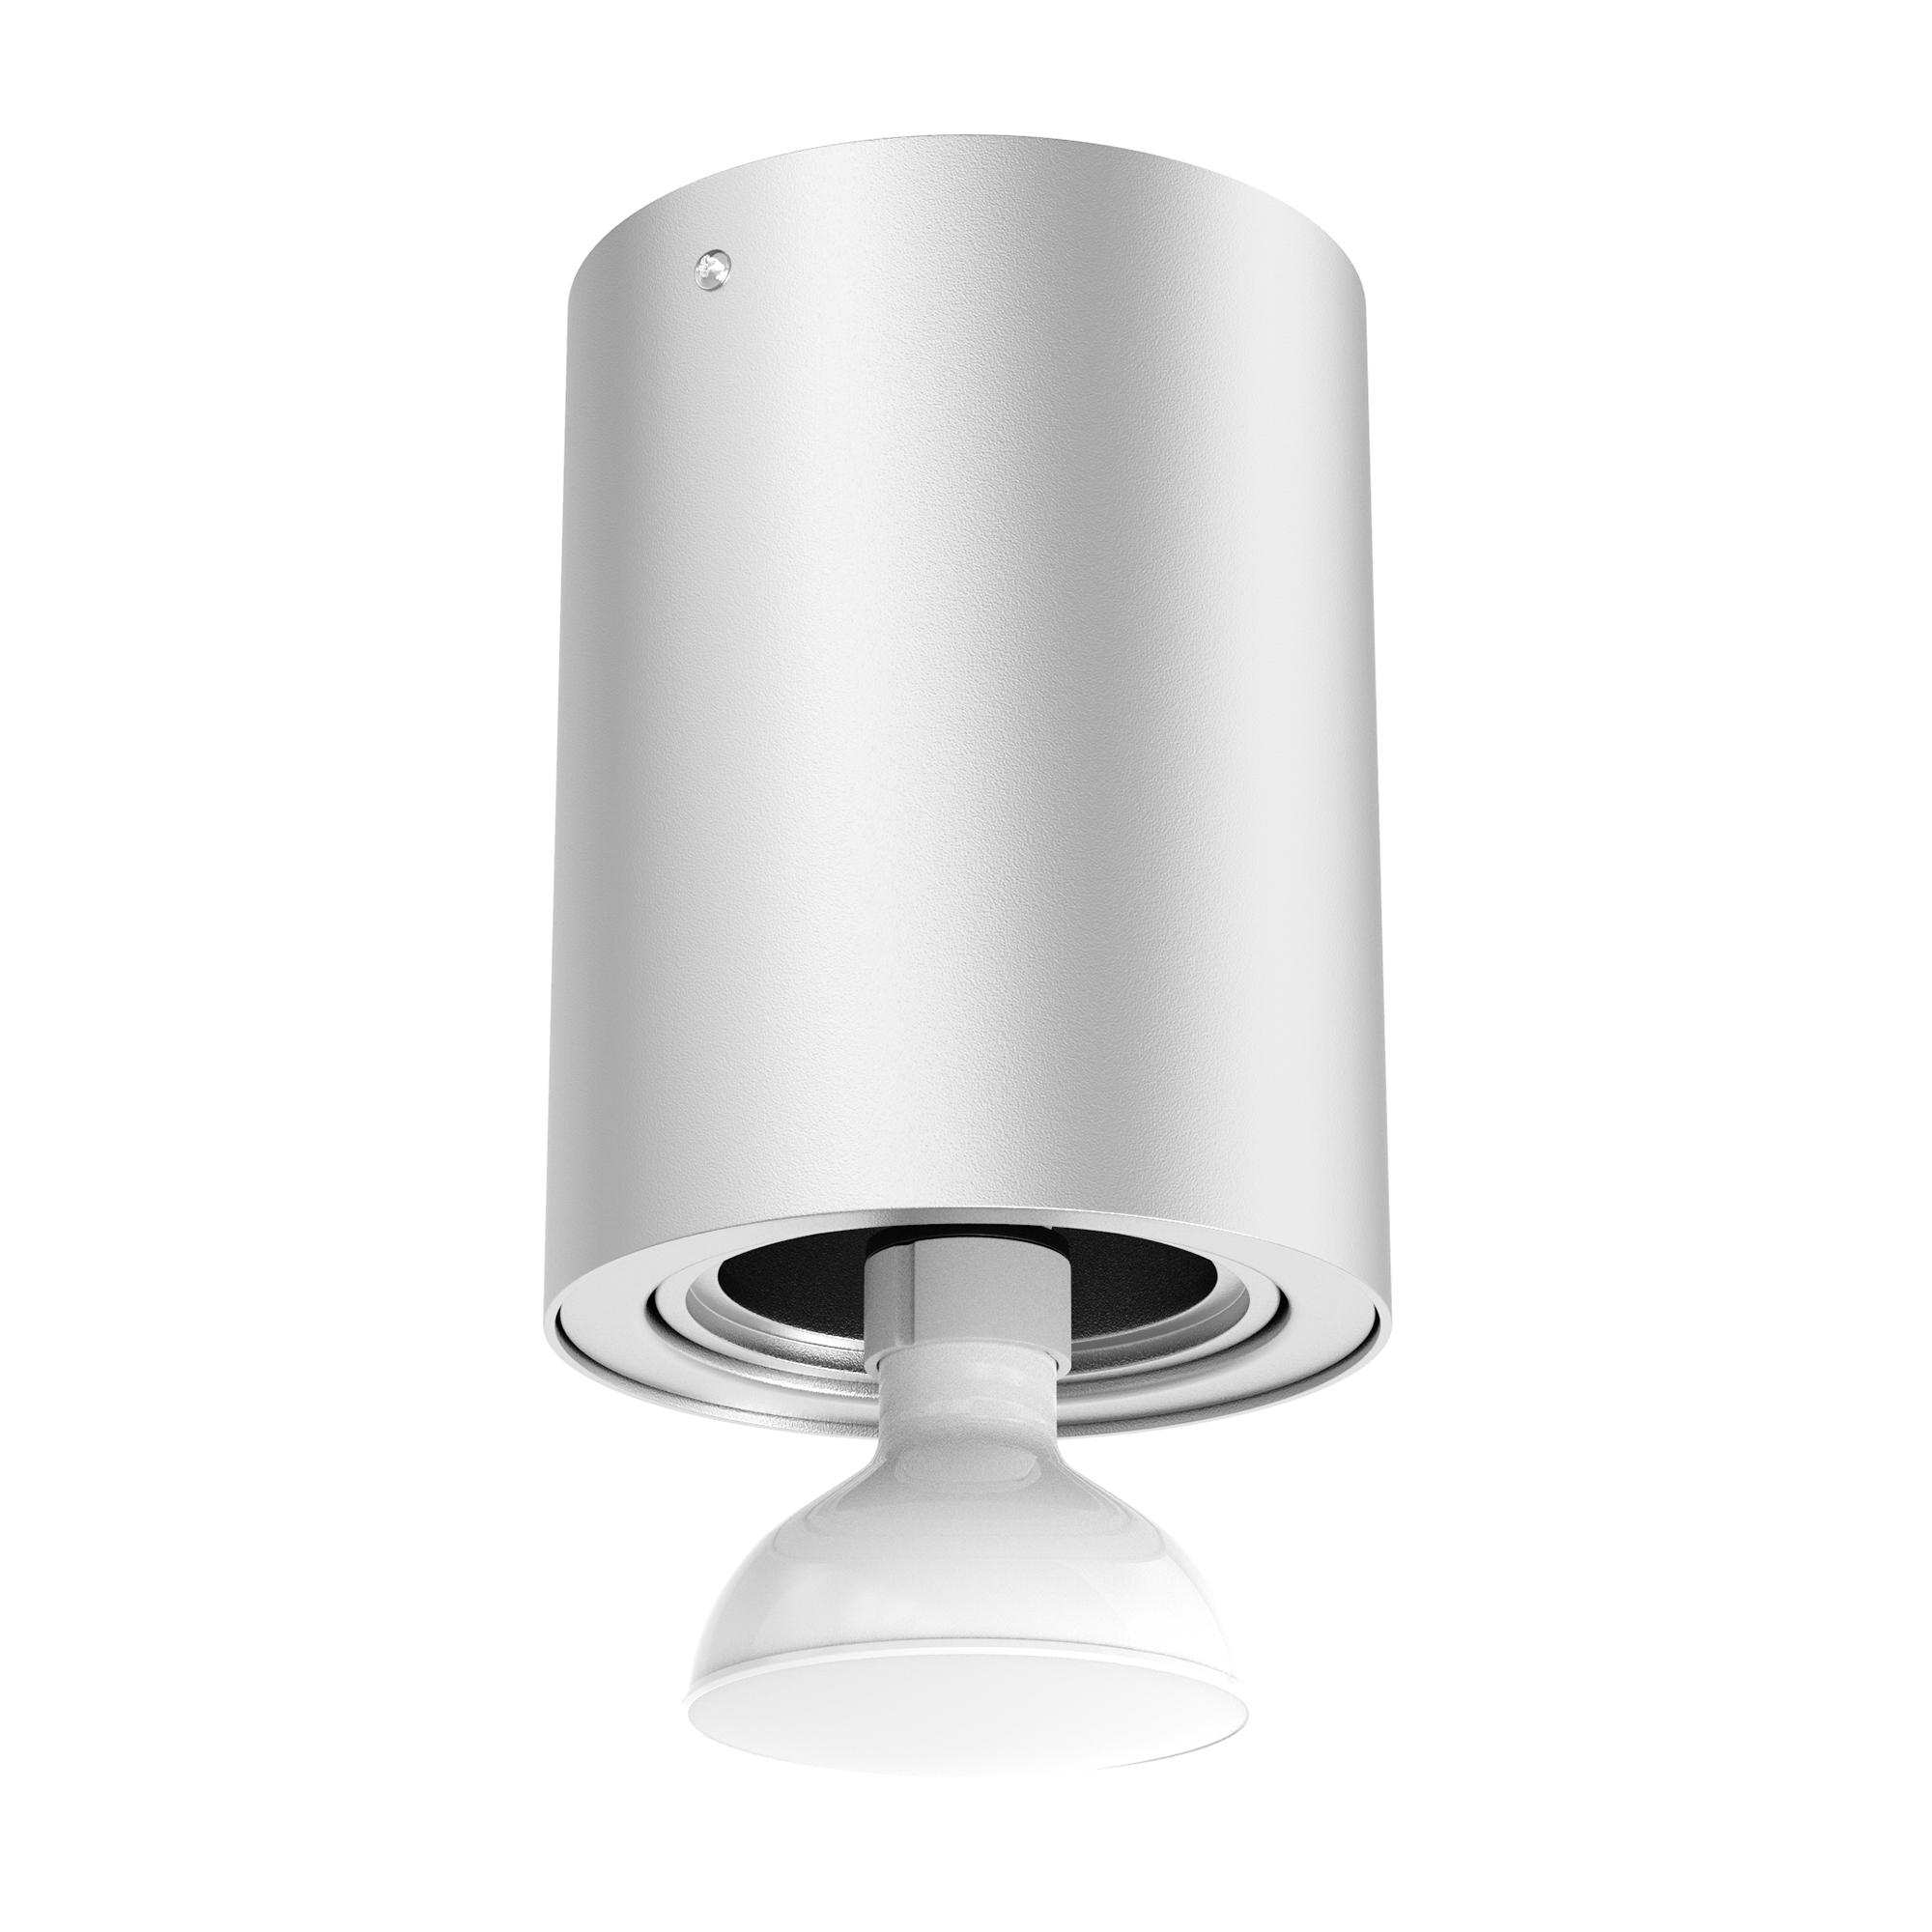 LED Aufbauleuchte Silber